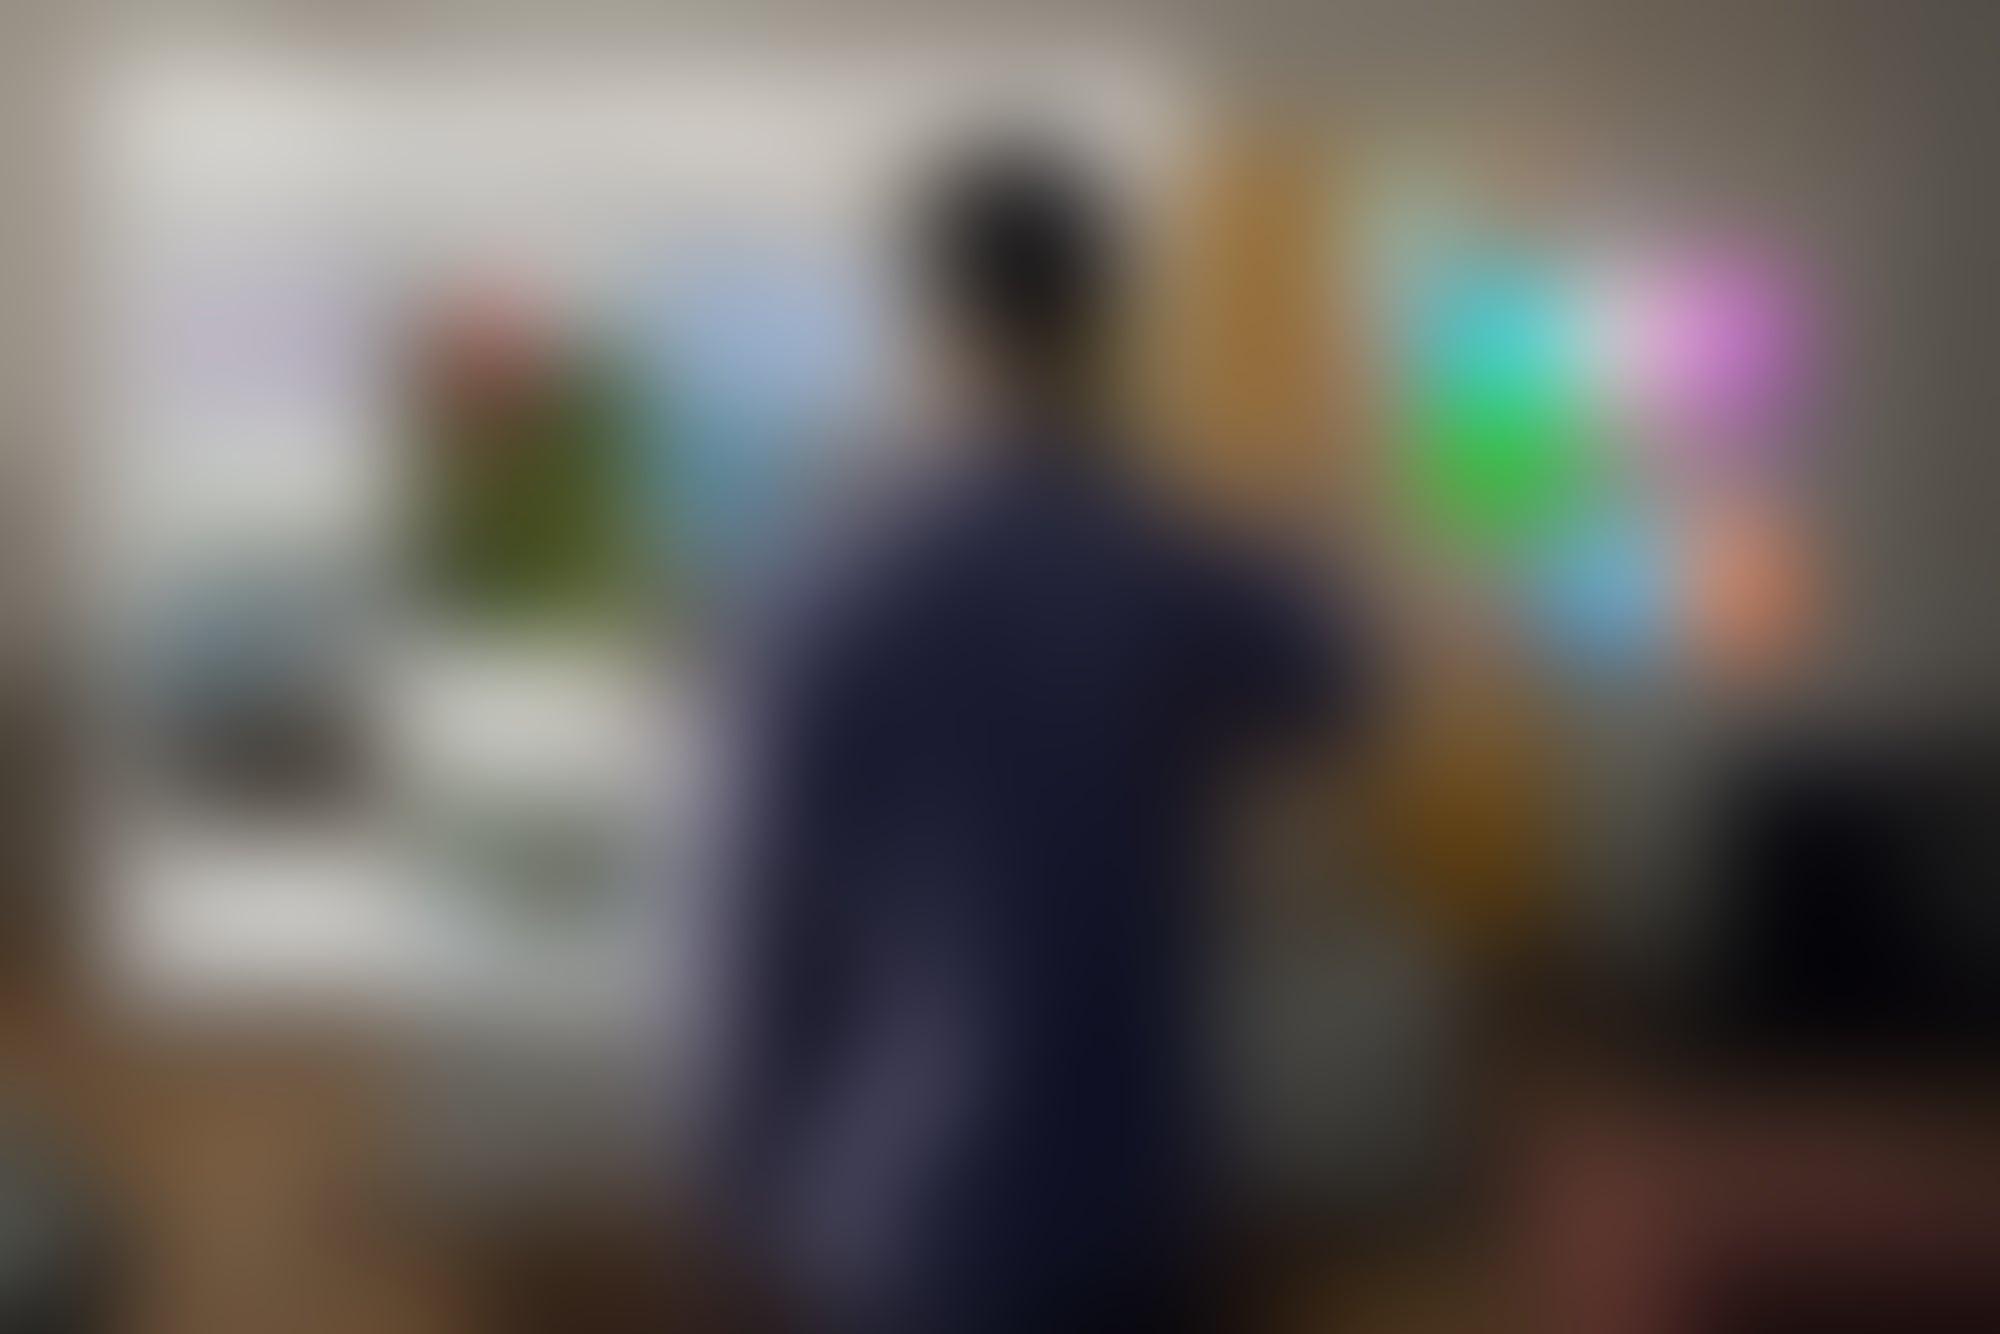 Microsoft Pushes Toward Virtual Reality With Hologram Headset